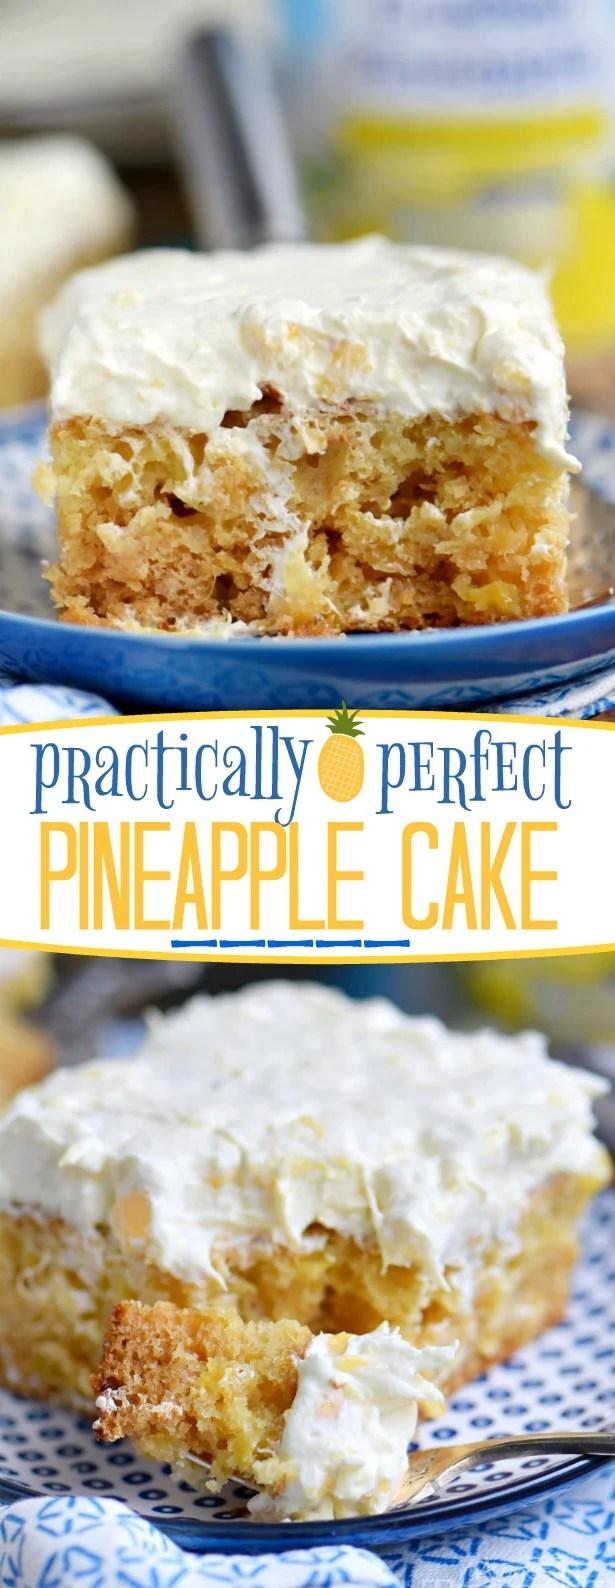 Pineapple Cake 9x13